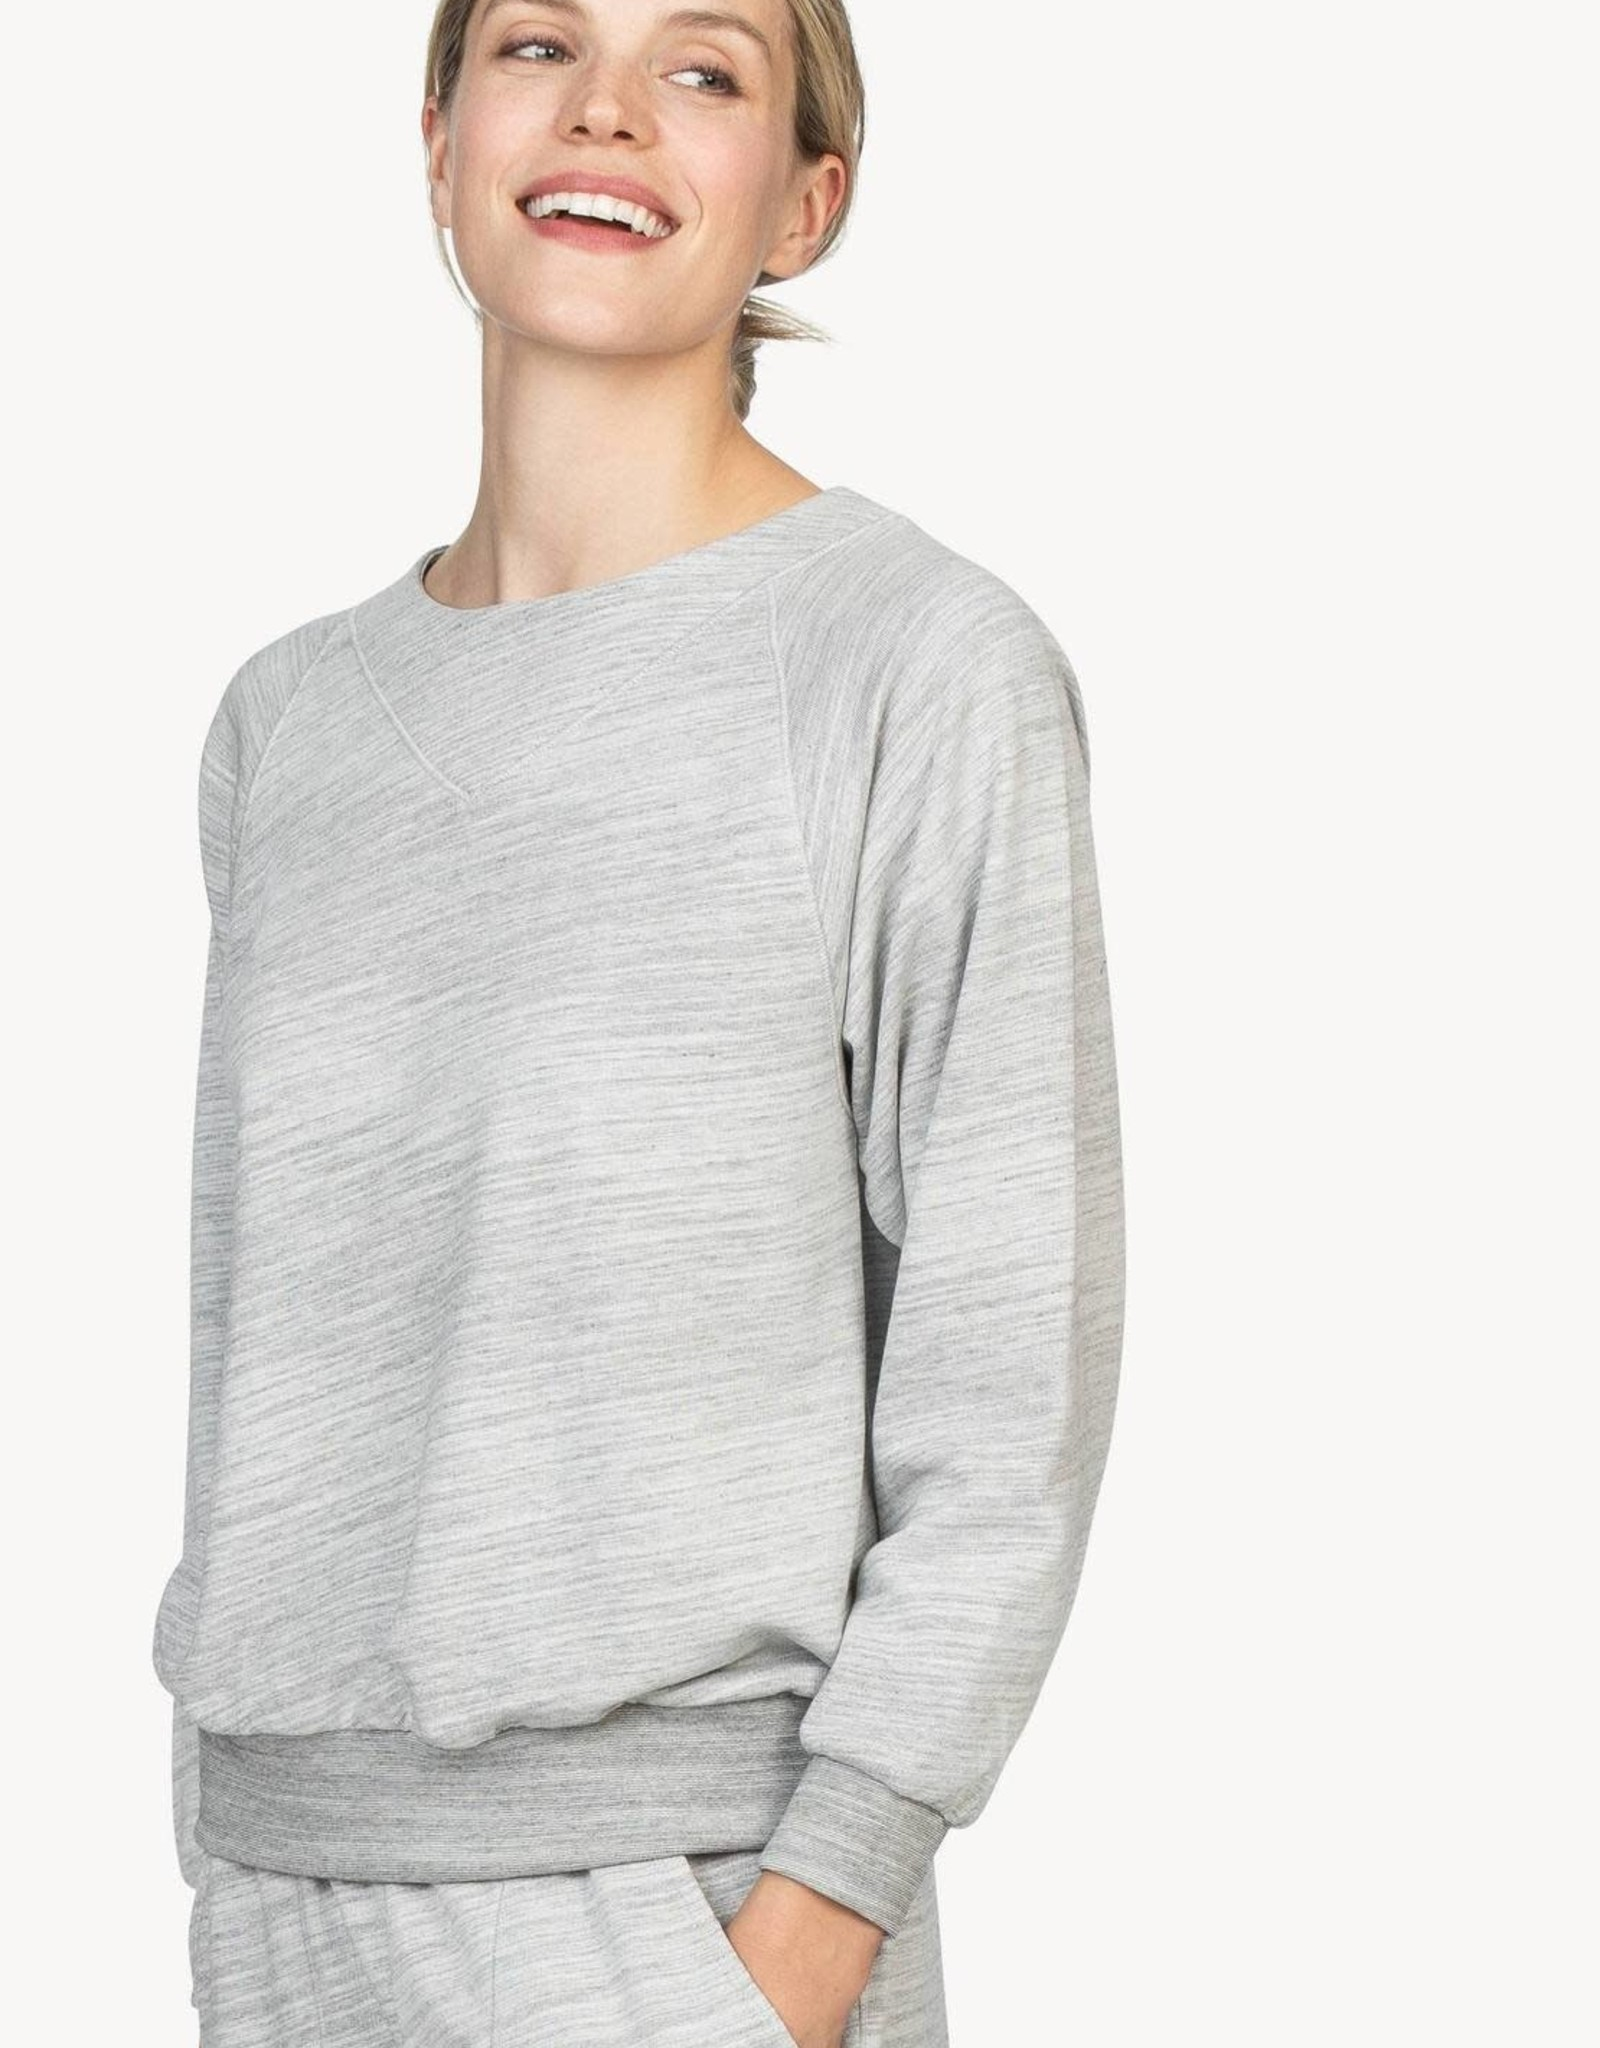 Lilla P Lilla P Raglan Sweatshirt Grey